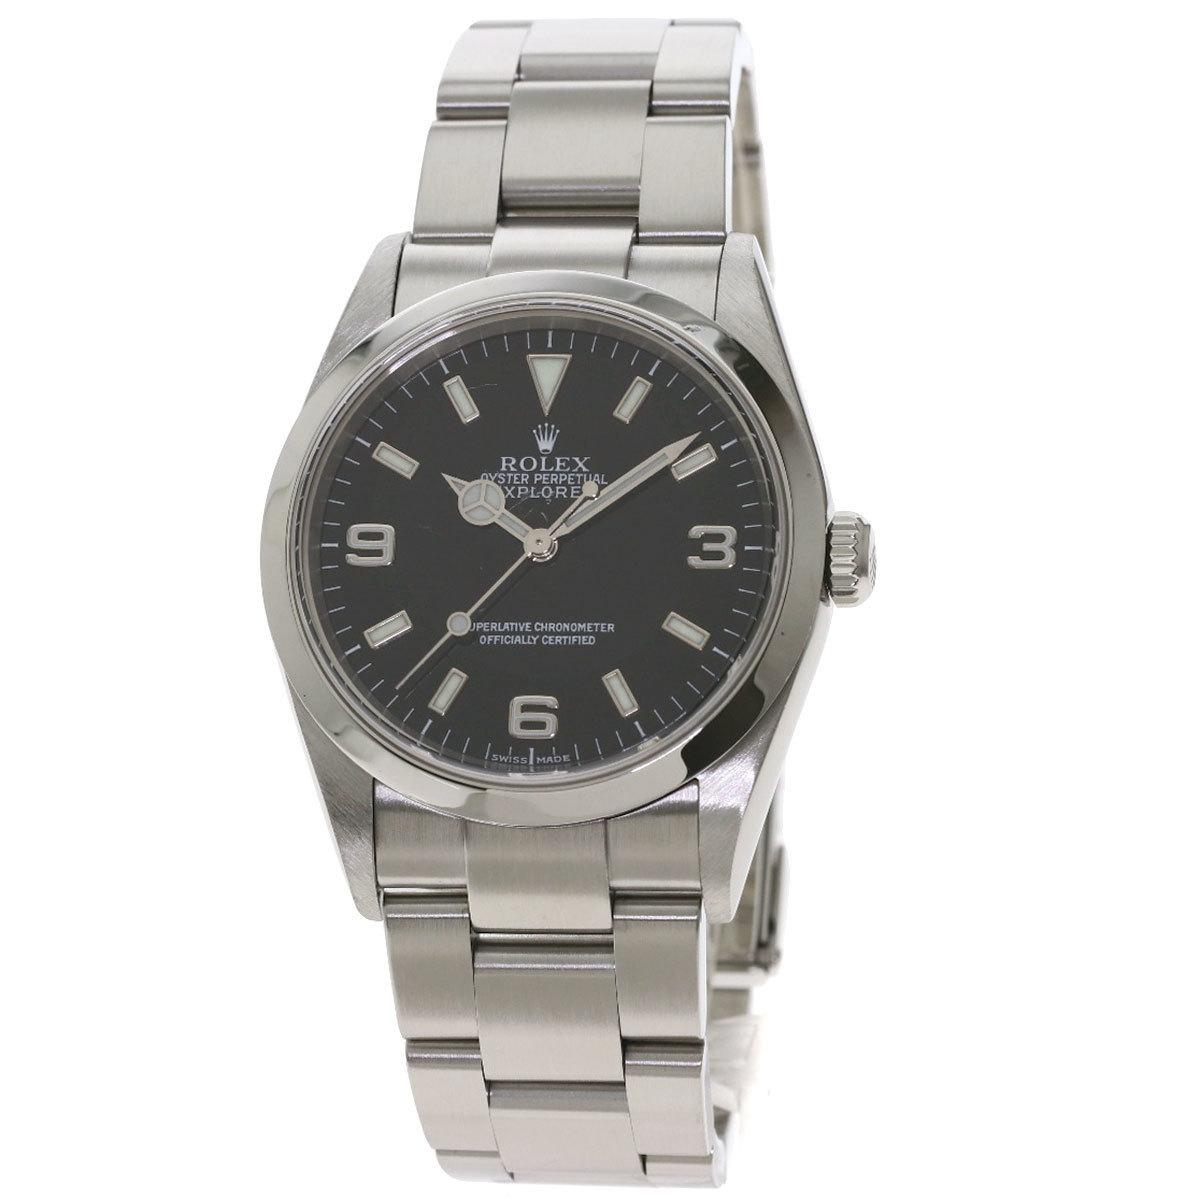 Rolex 114270 Explorer 1 Watch Stainless Steel Mens